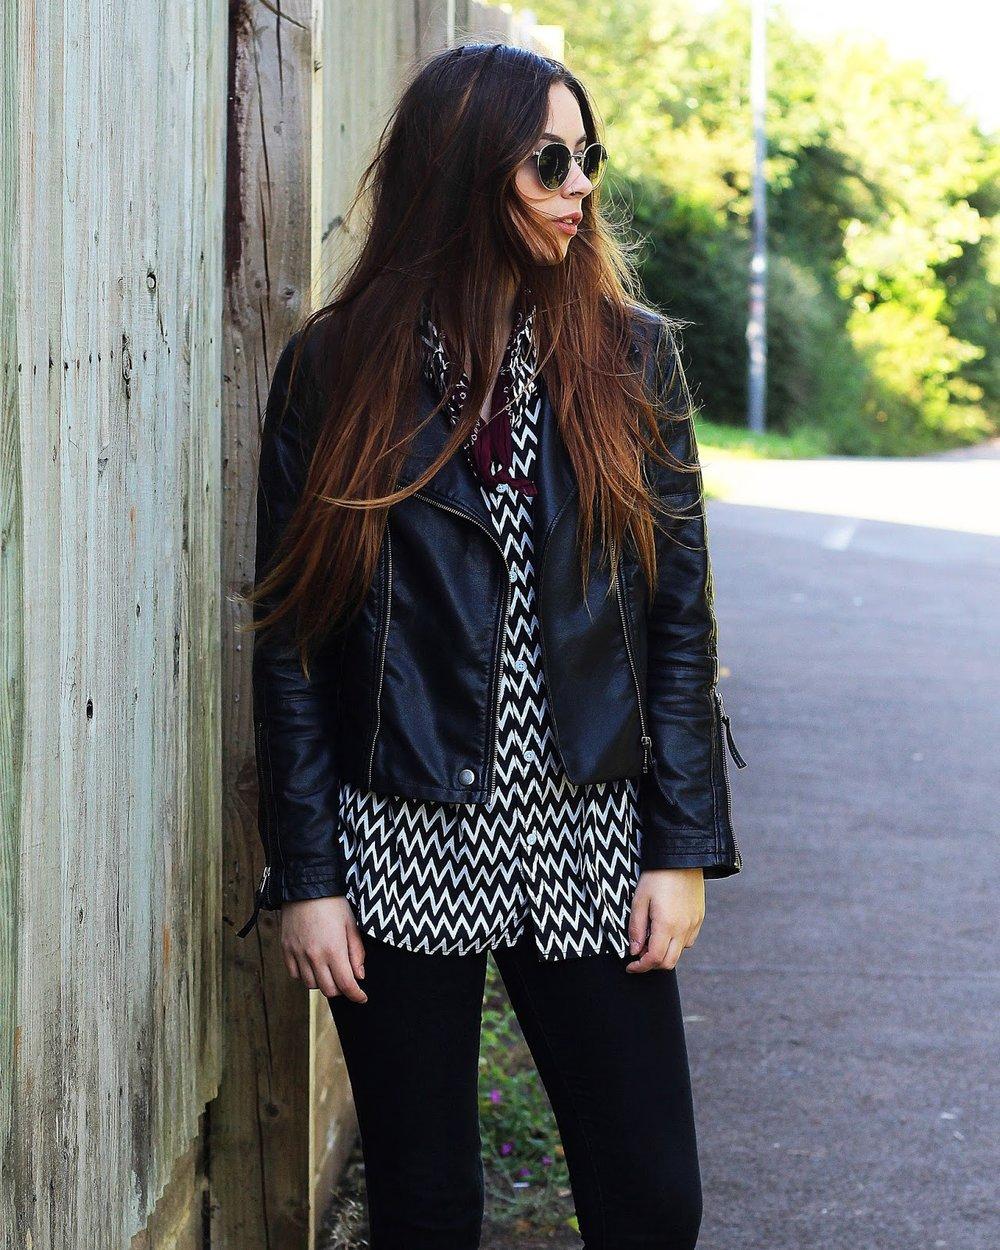 9bb84dc5d9 Shirt - Primark, jeans - Primark, jacket - Primark, shoes - Vans Classics,  sunglasses - Matalan, bandana - Claires Accessories.